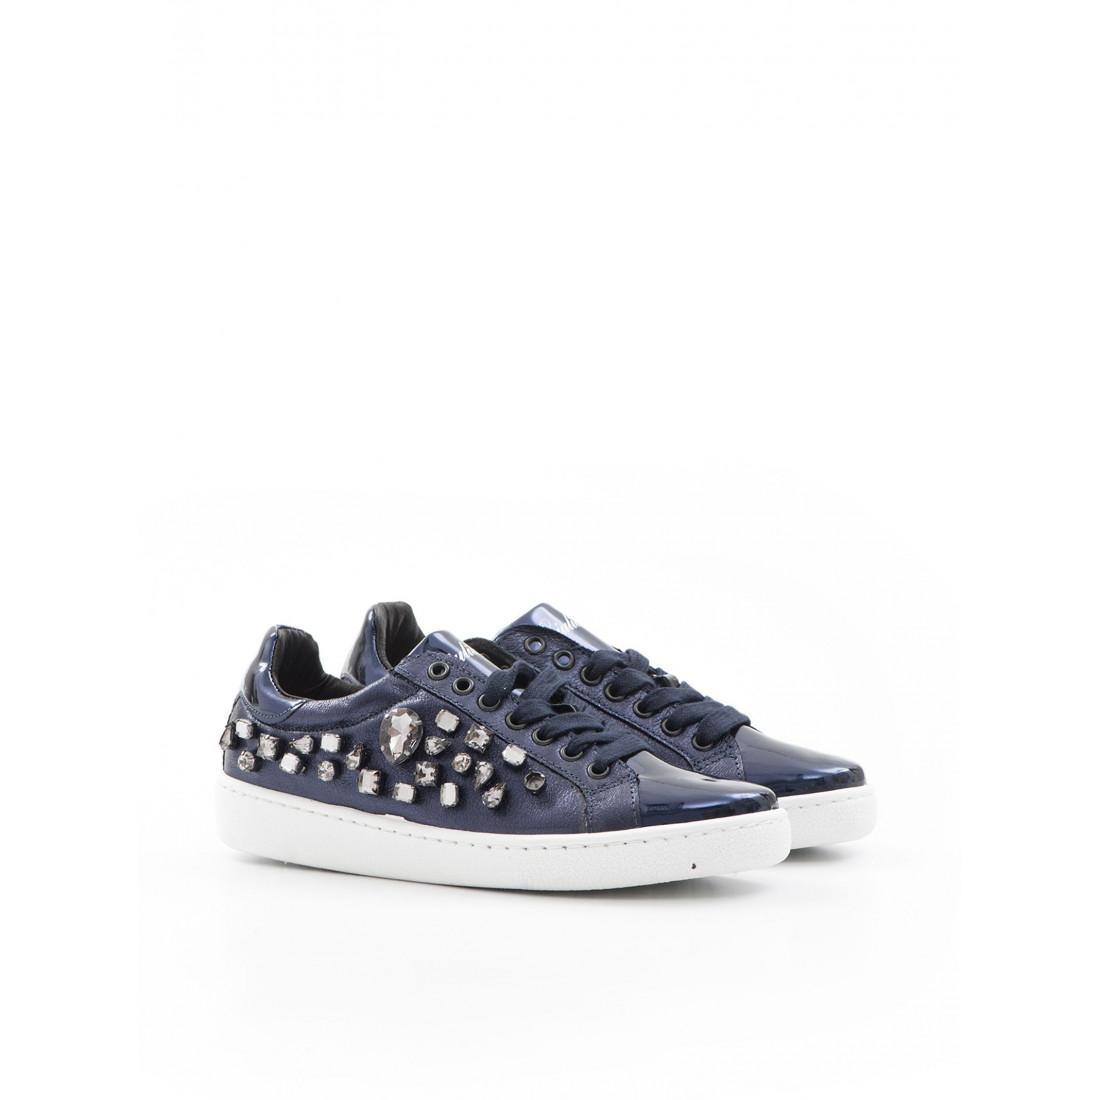 sneakers donna giulia n 1000pietre 8 blu 957